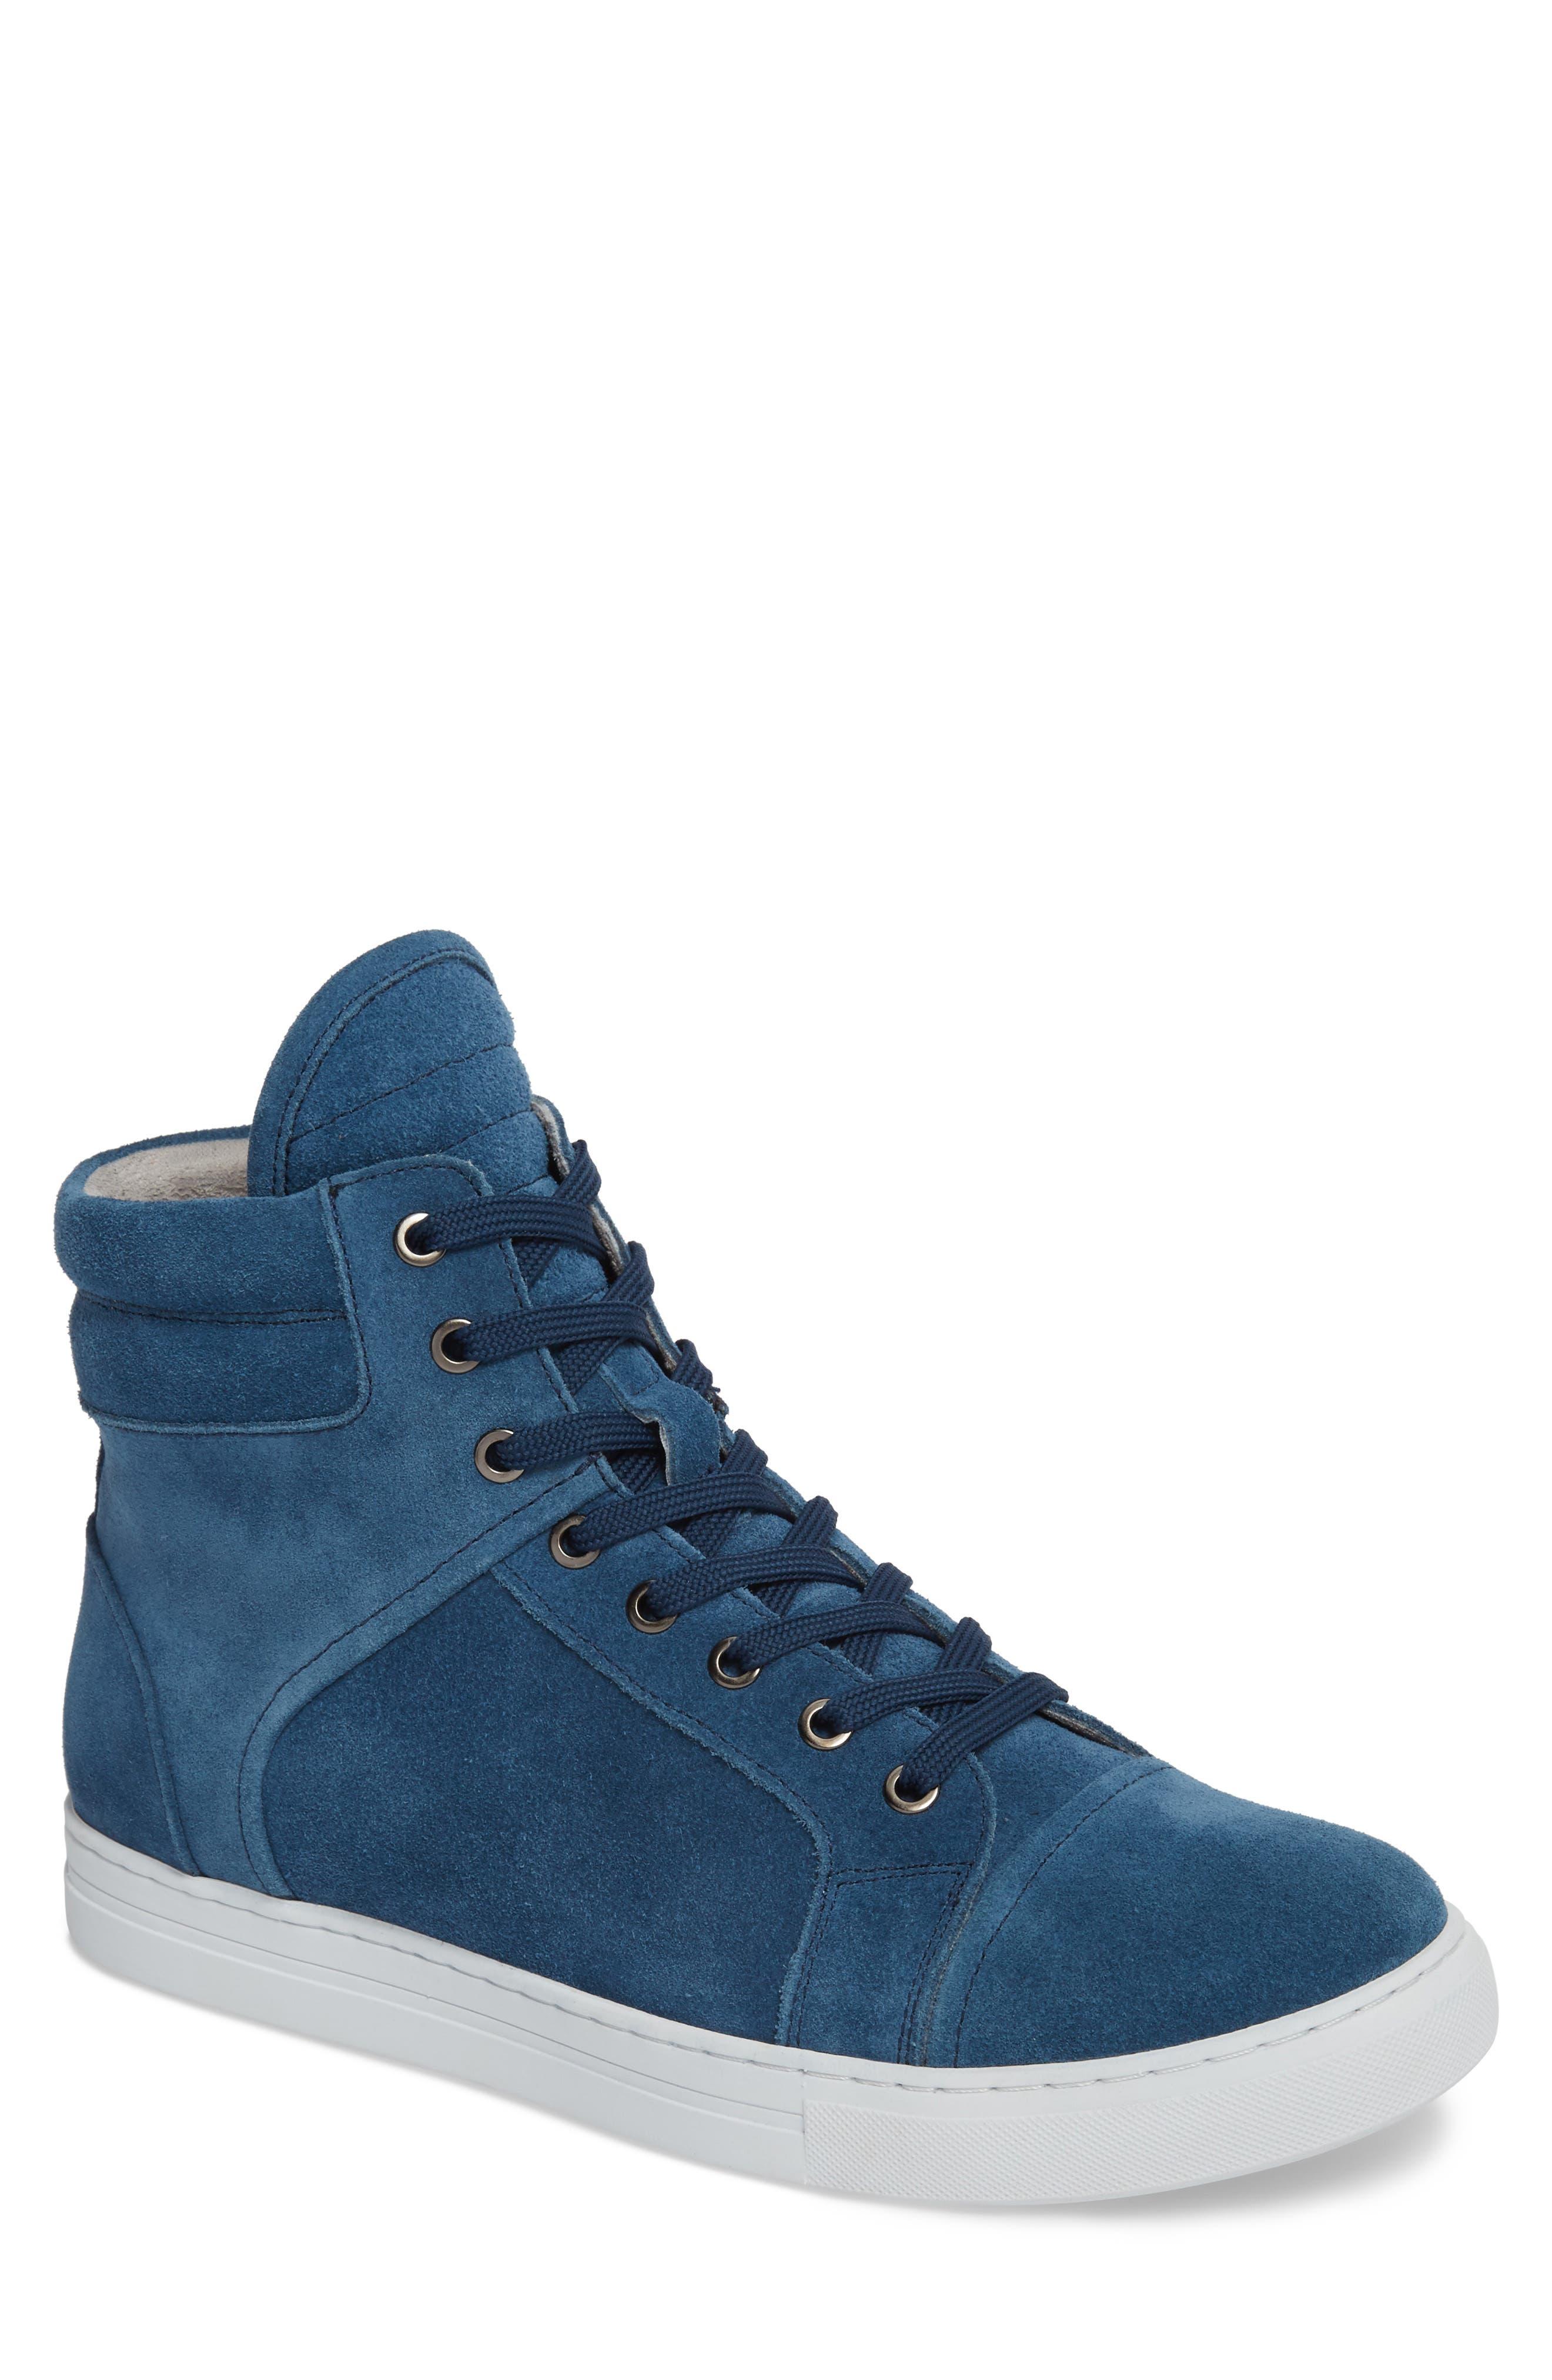 Double Header Sneaker,                         Main,                         color, Blue Suede